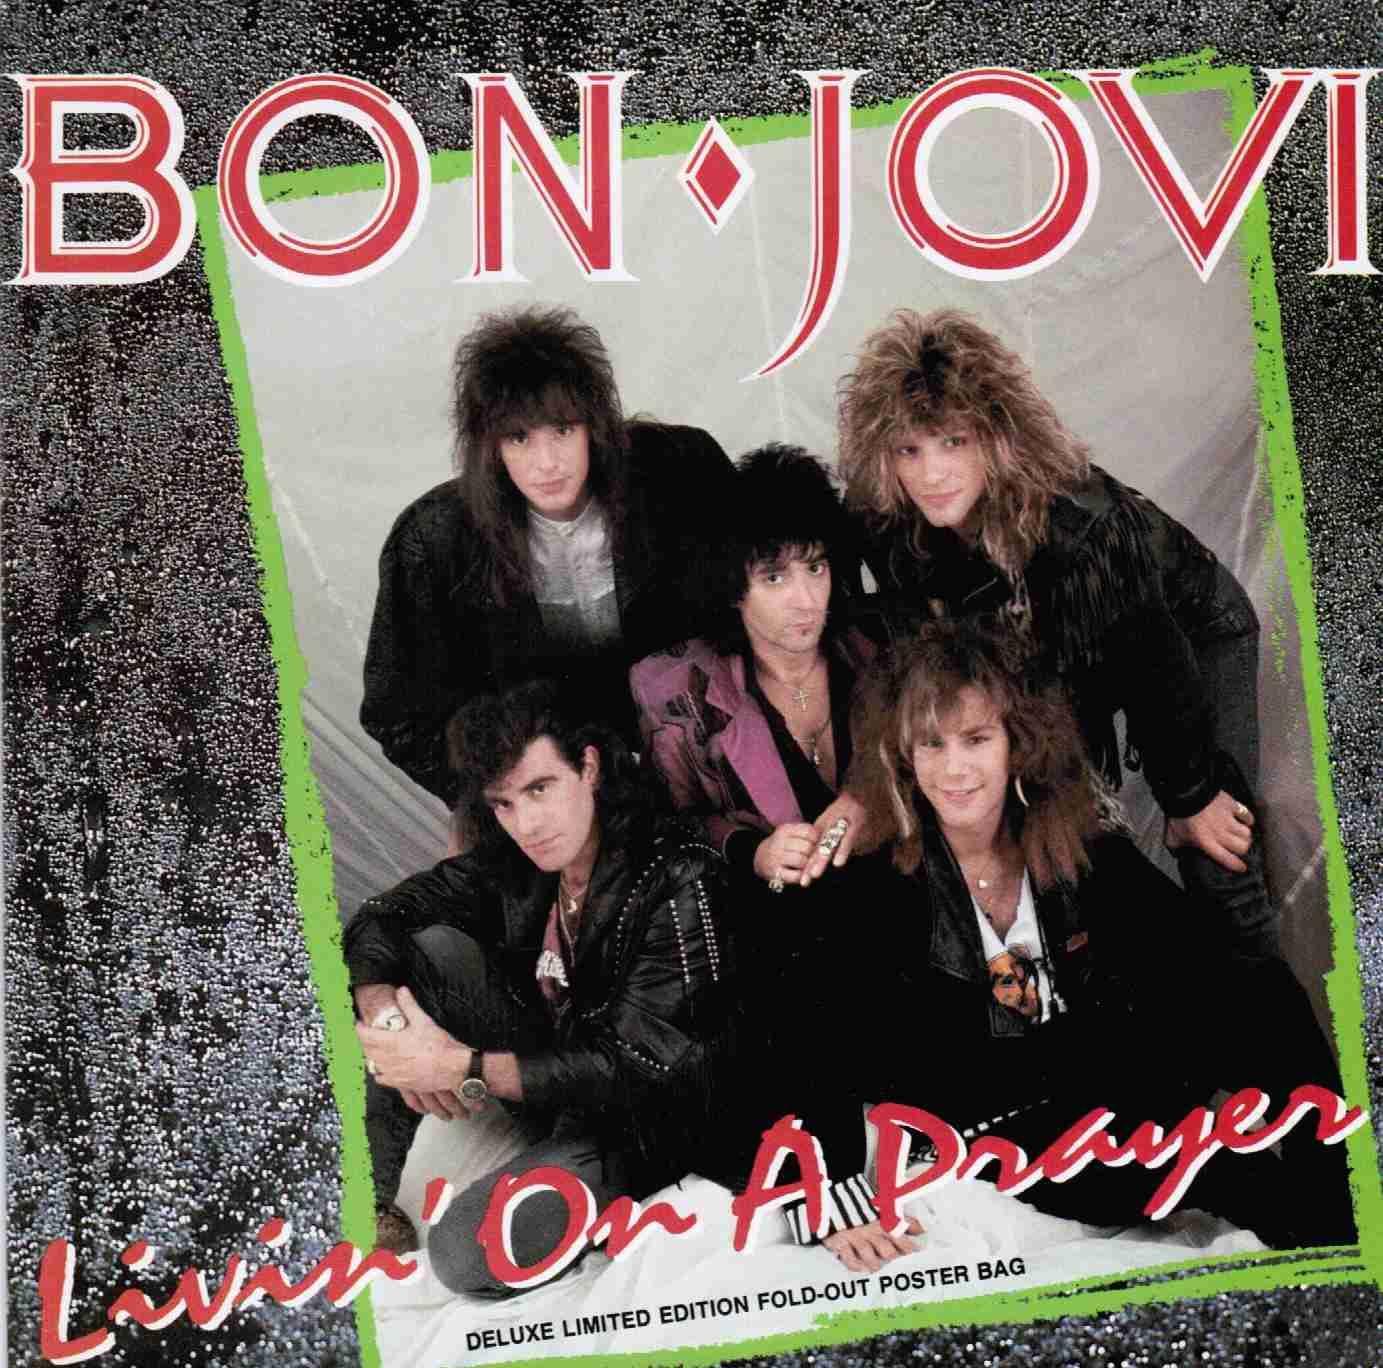 100 Of The Best Pop Songs Of All Time Pop Songs Bon Jovi Bon Jovi Album